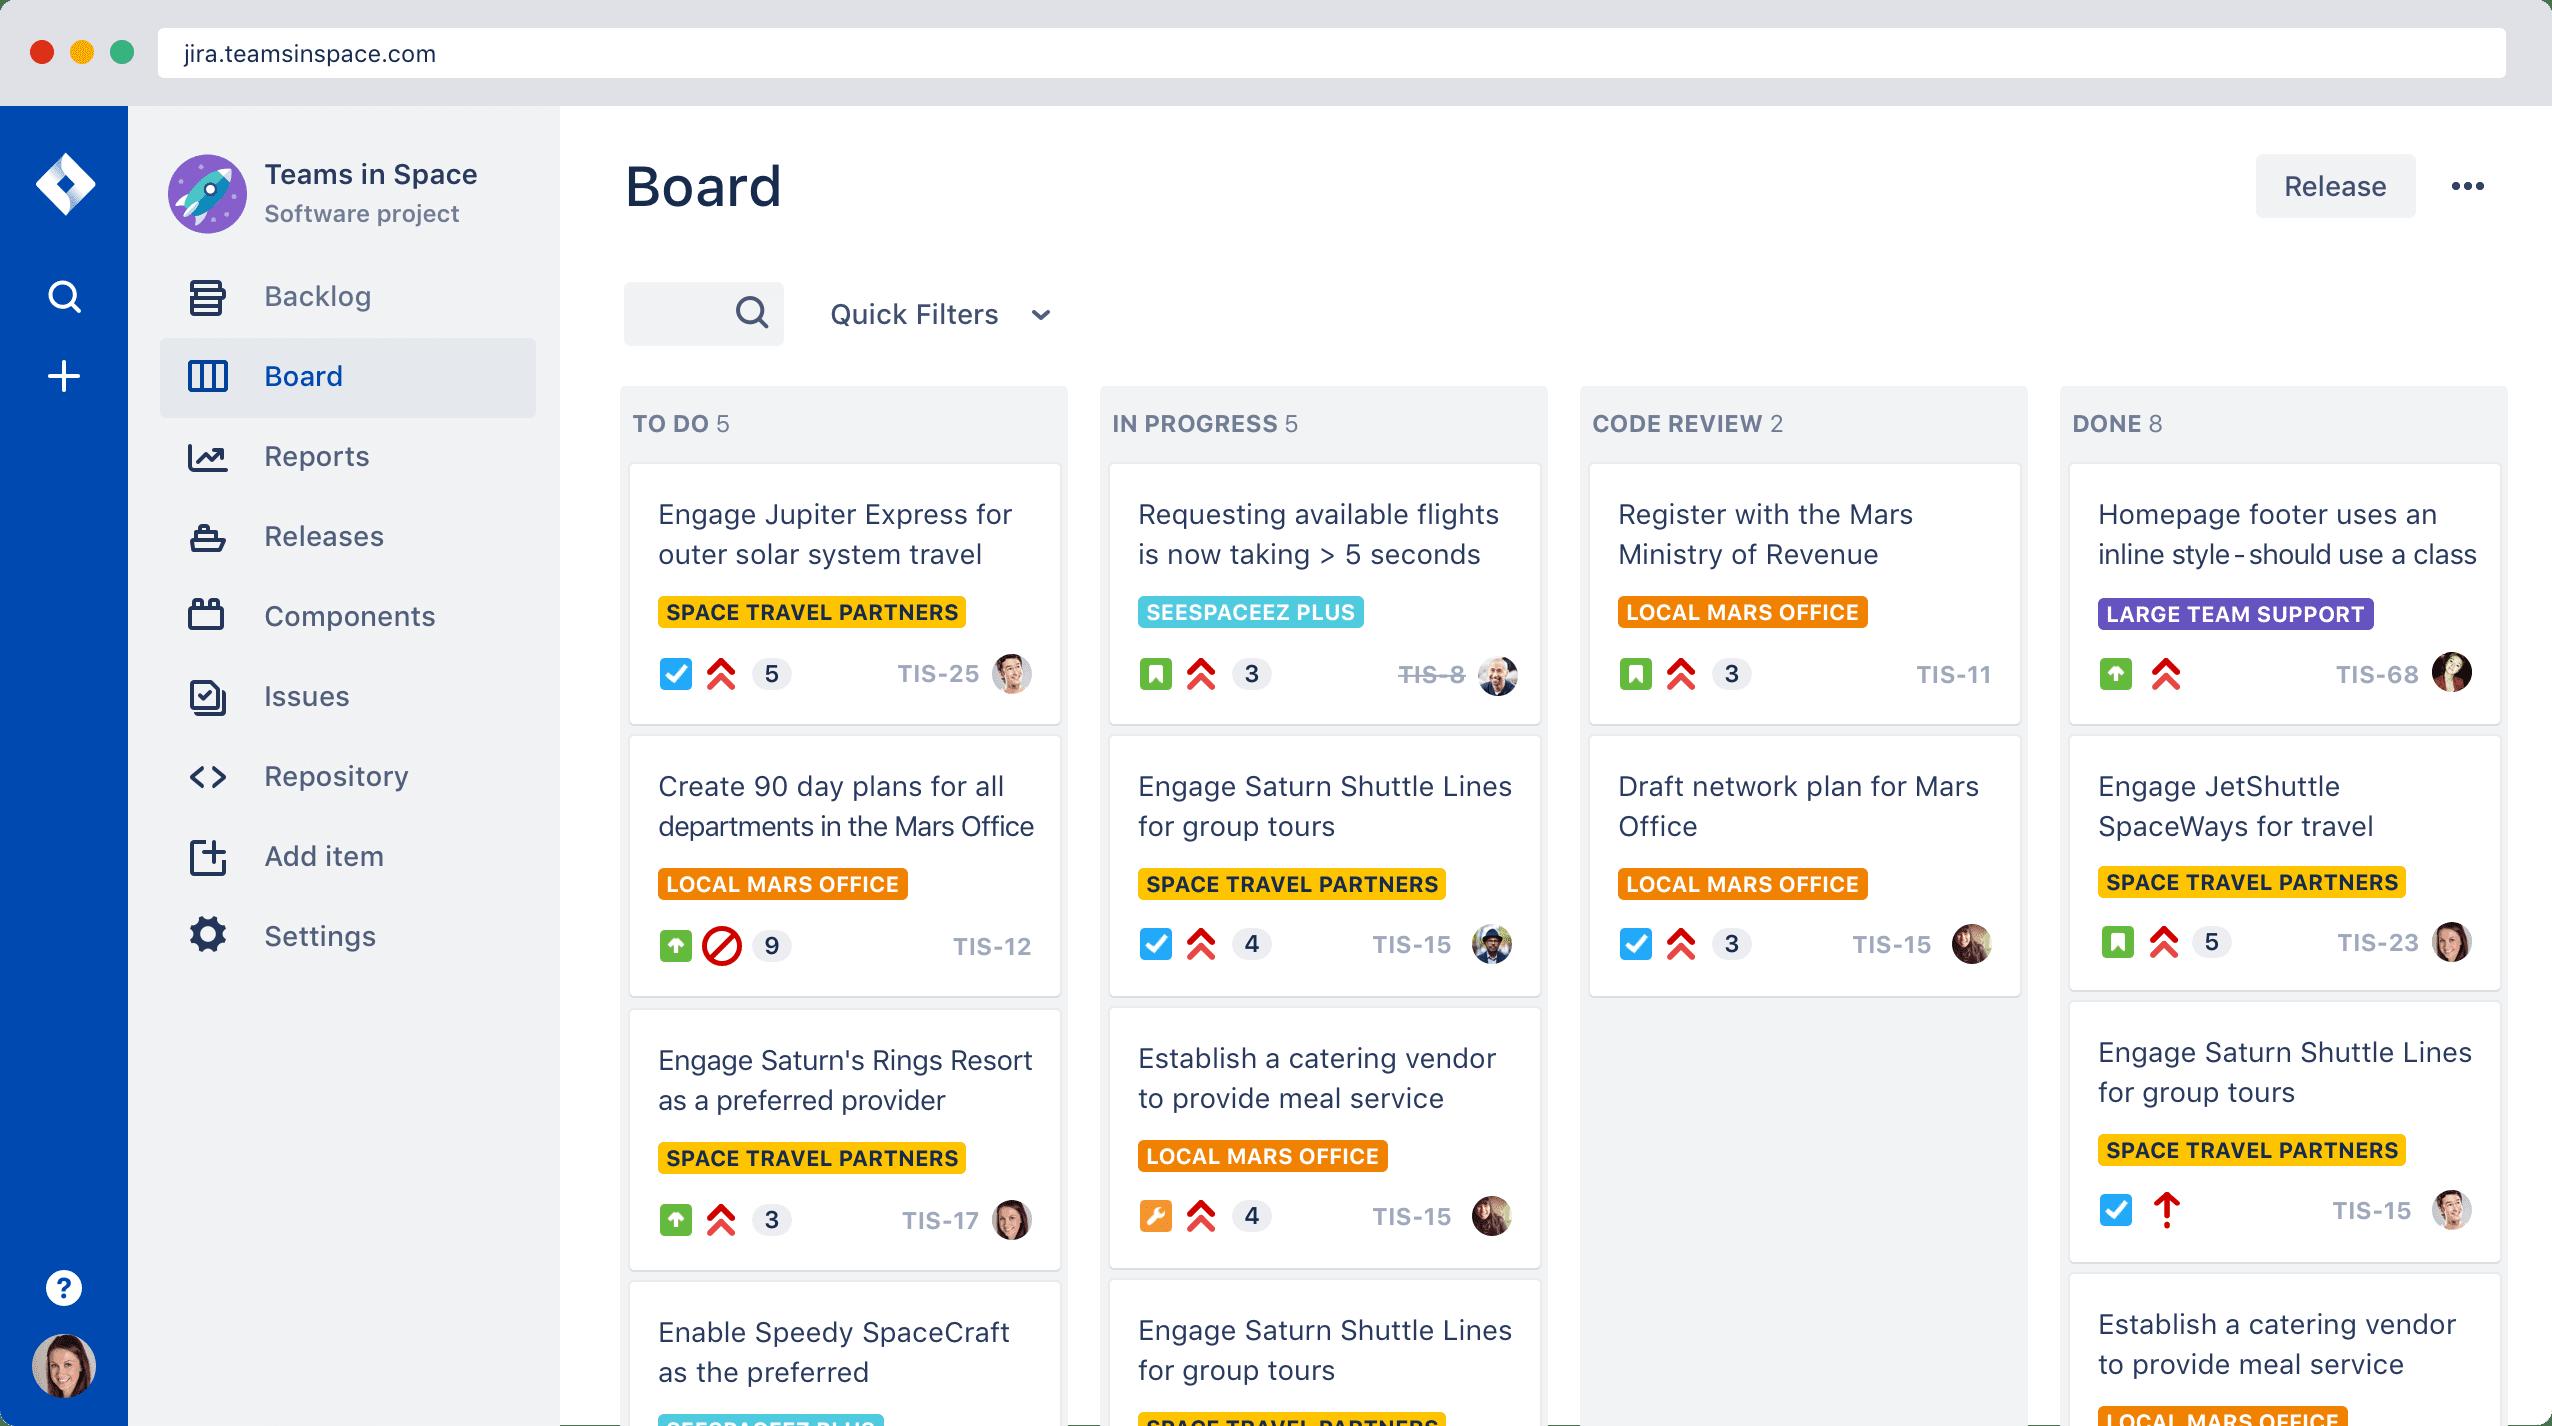 Интерфейс приложения Jira